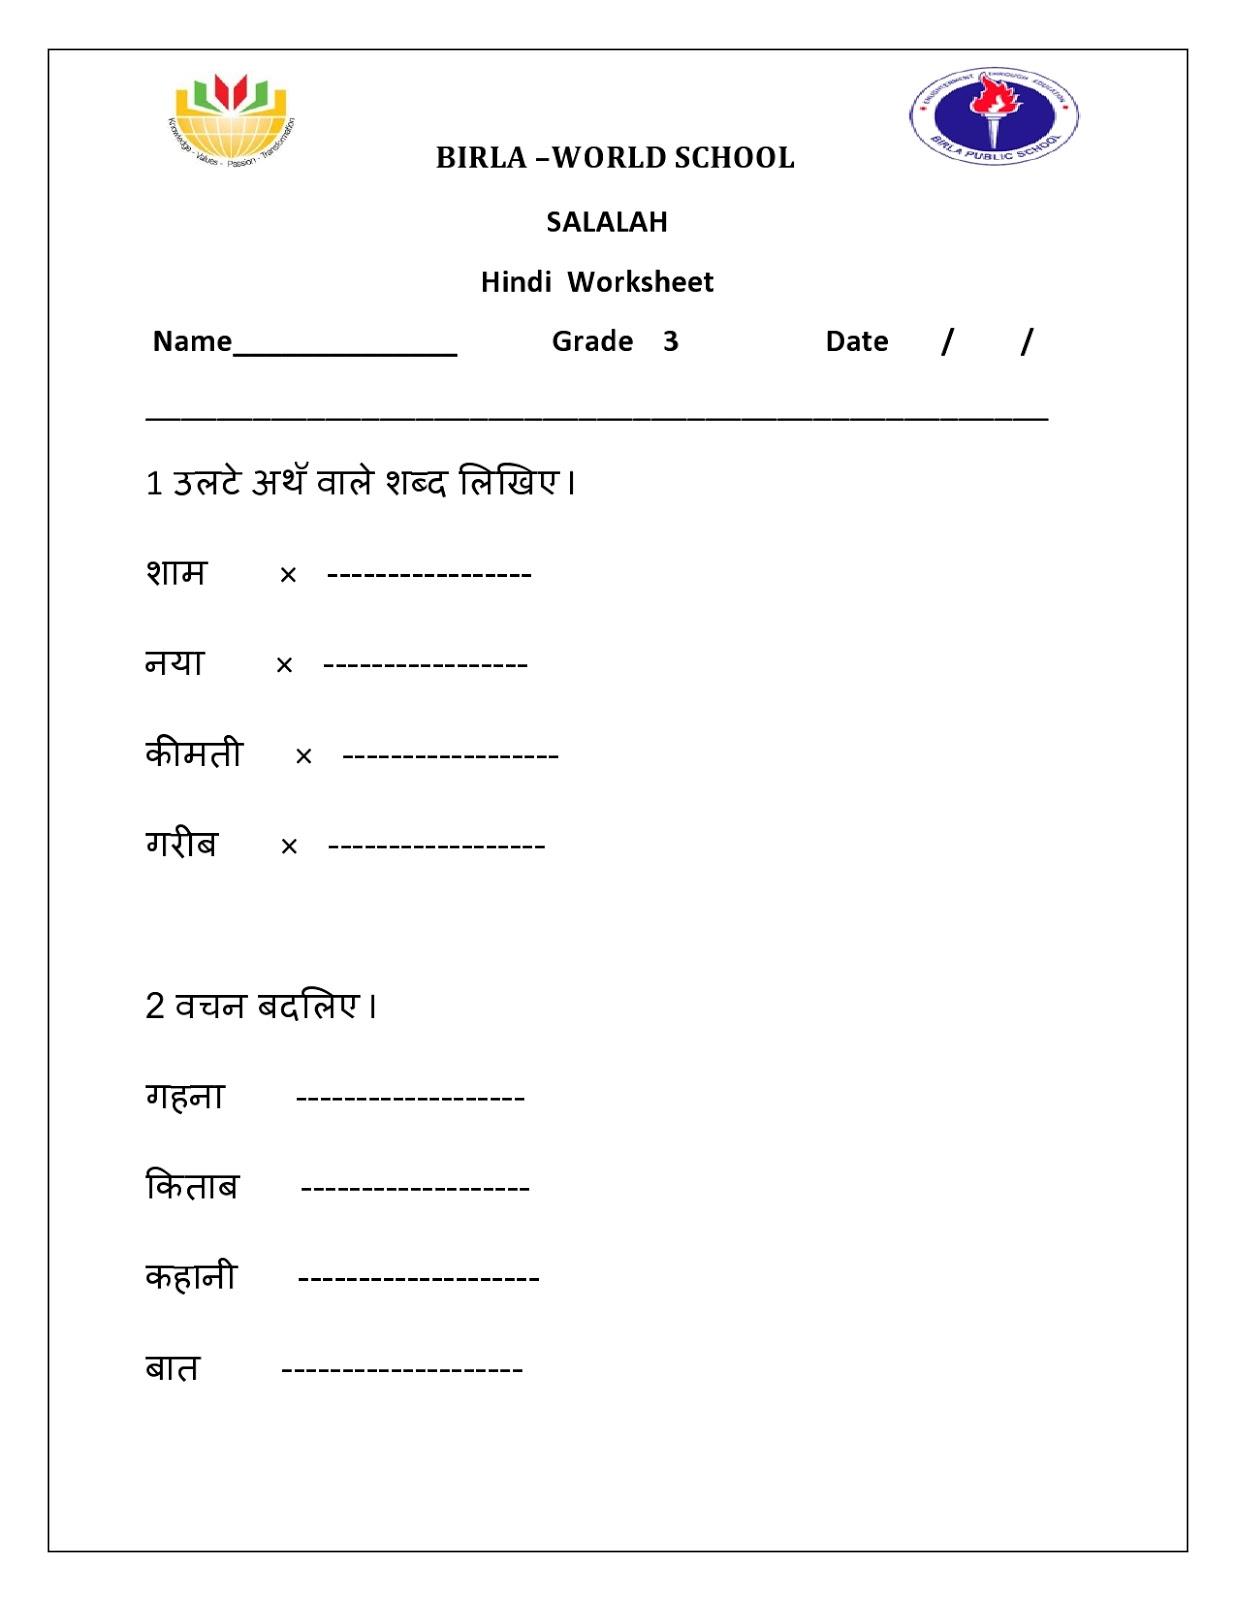 medium resolution of Hindi Worksheet For Teachers   Printable Worksheets and Activities for  Teachers